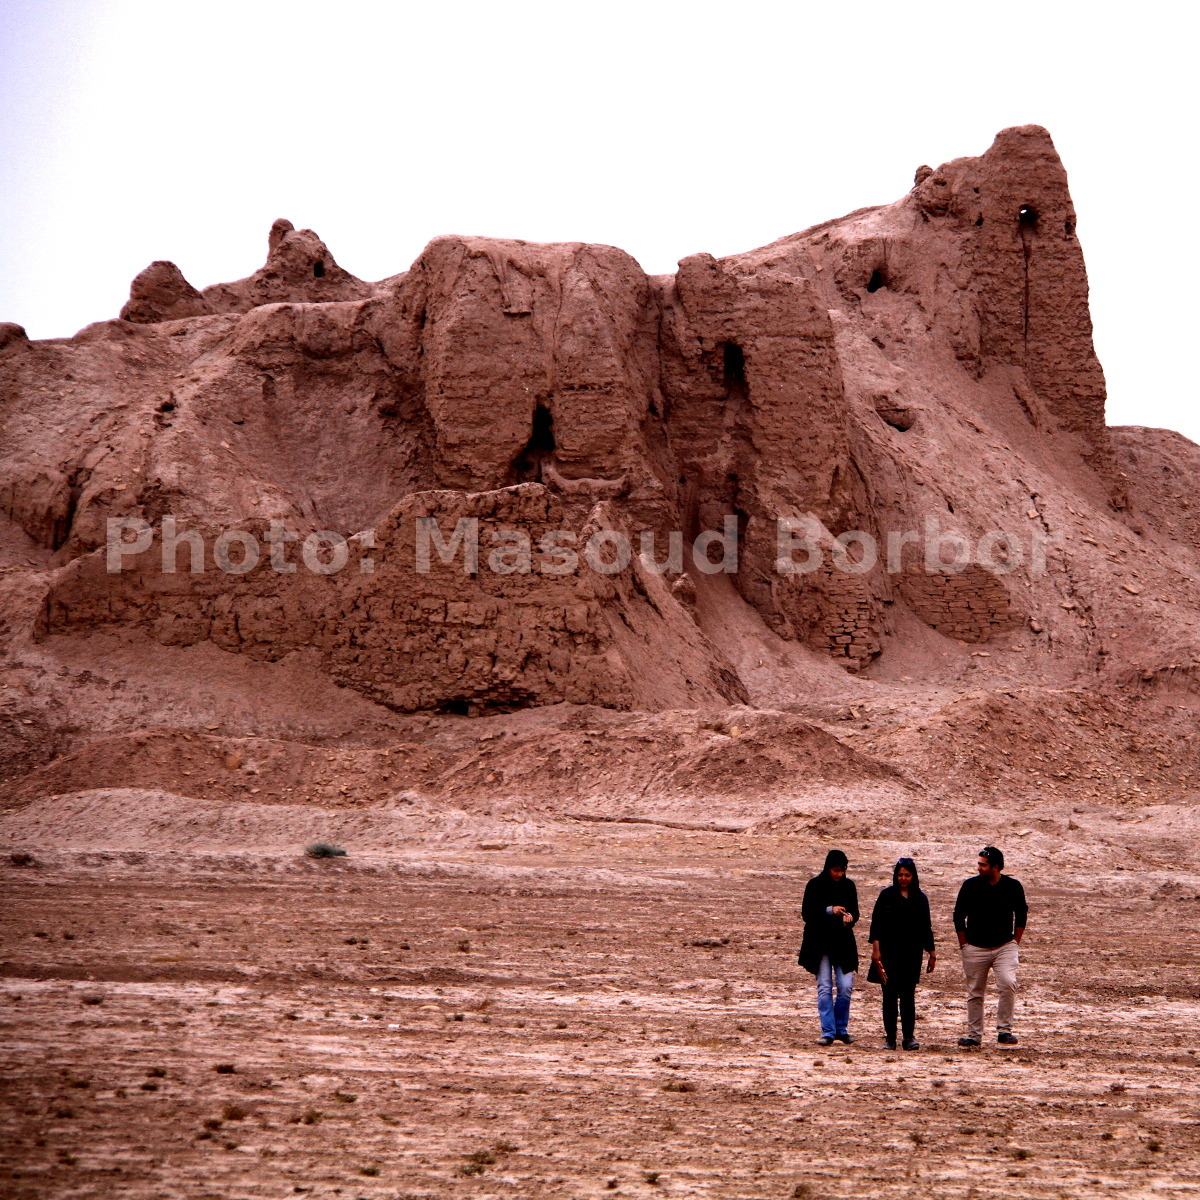 قلعه اشکانی